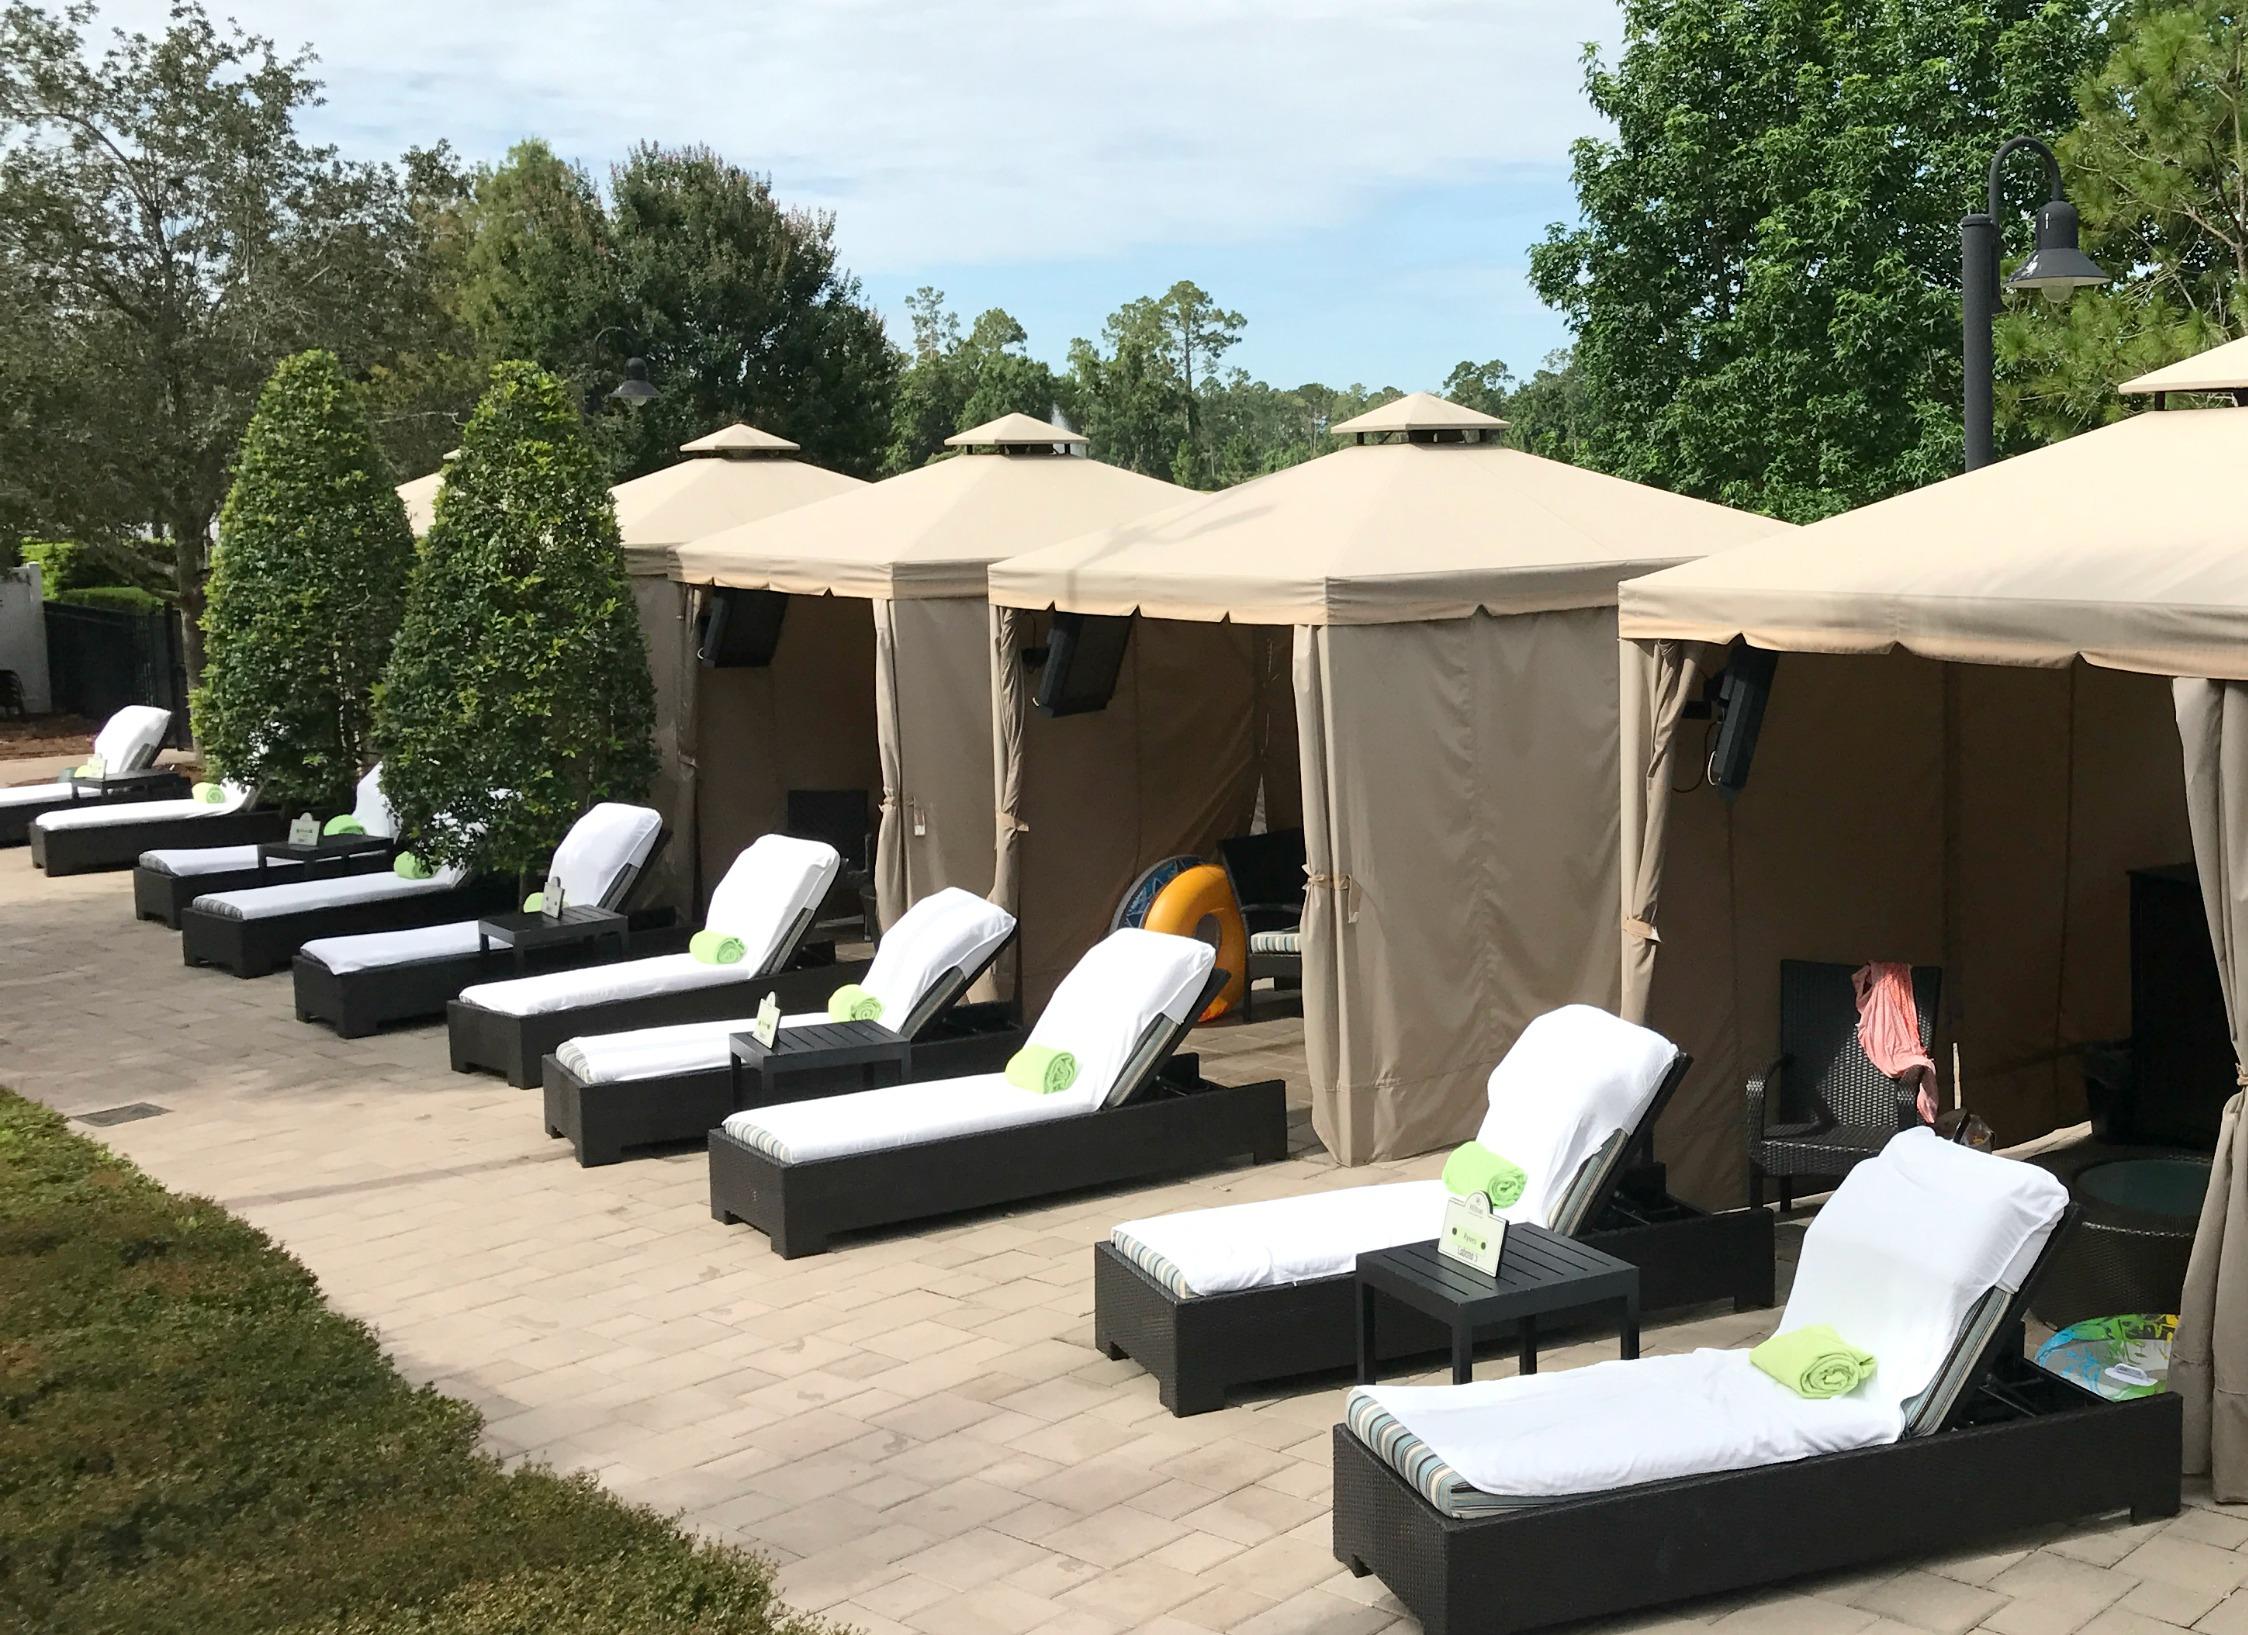 Hilton-bonnet-creek-review-family-disney-resort-cabanas